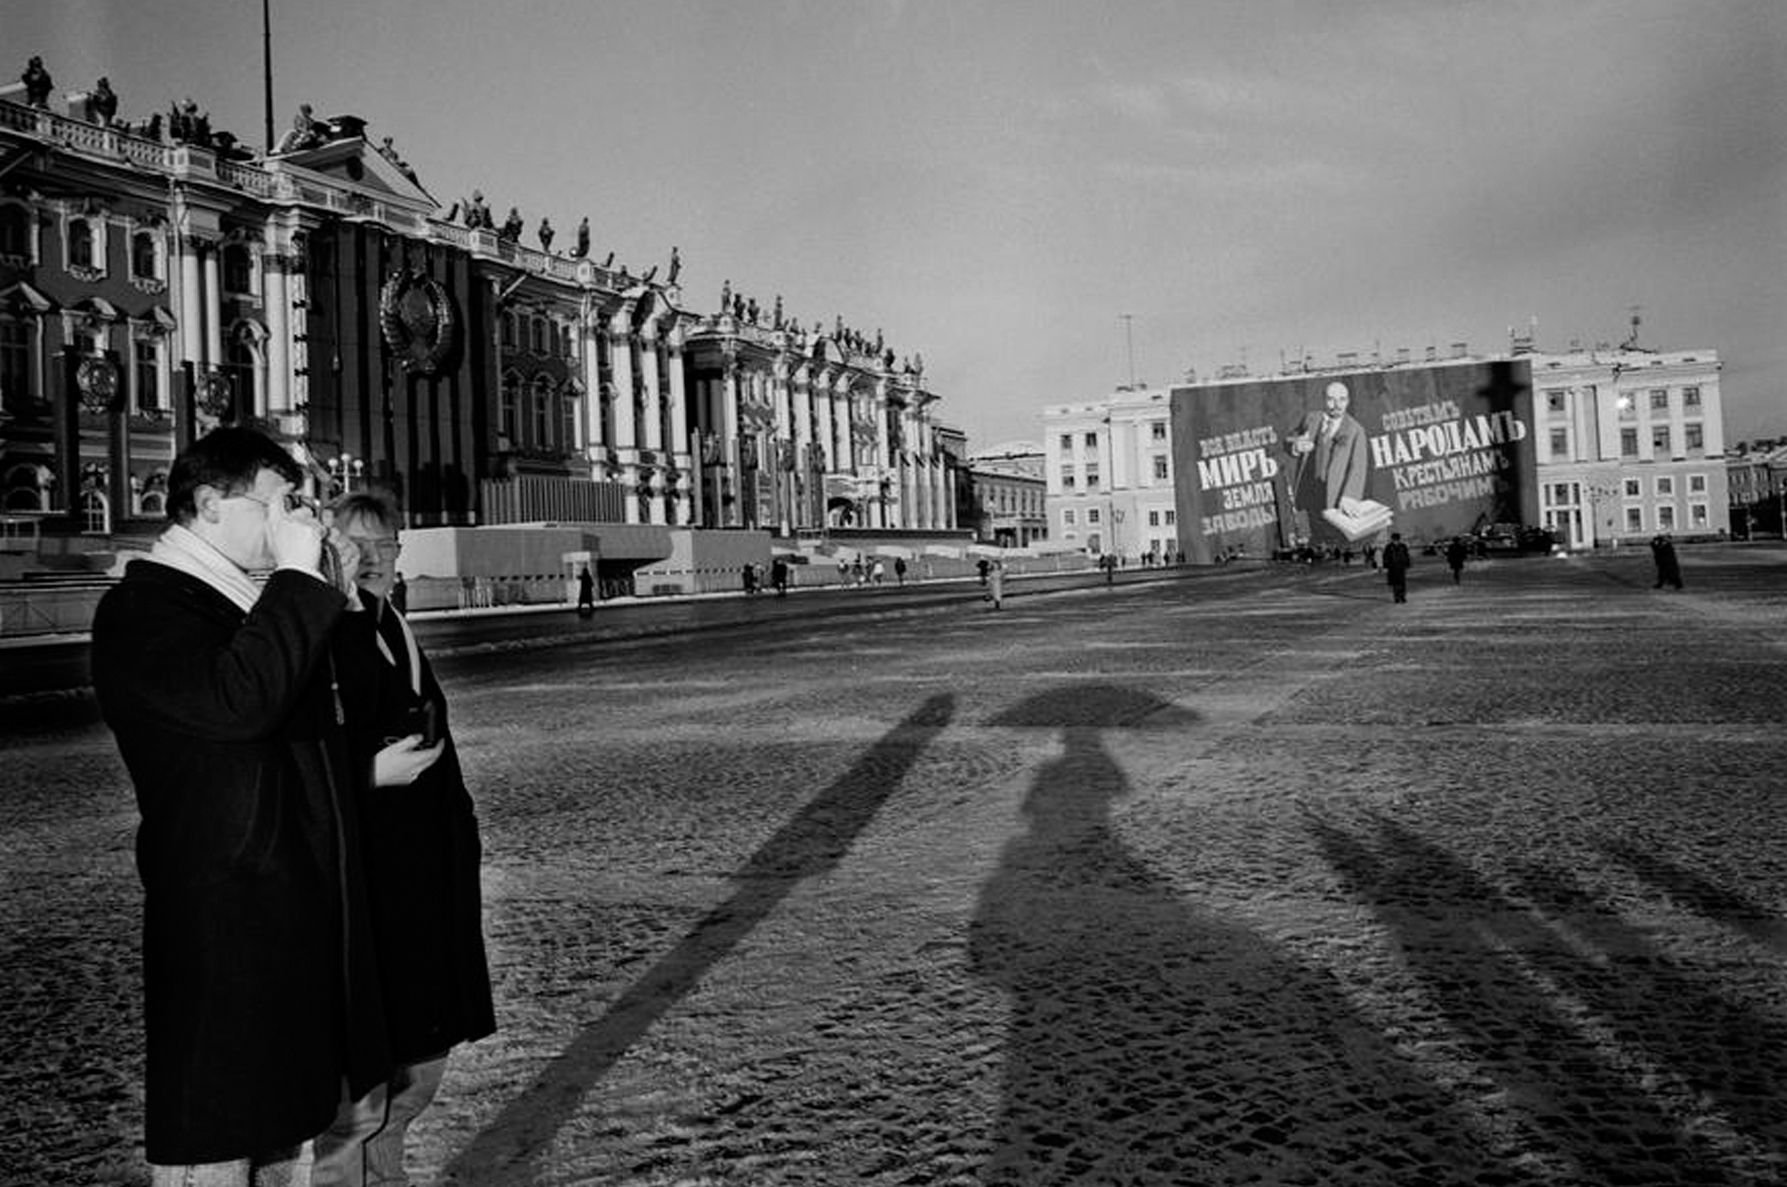 Карл де Кейзер. Эрмитаж. Дворцовая площадь. Санкт-Петербург. 1988